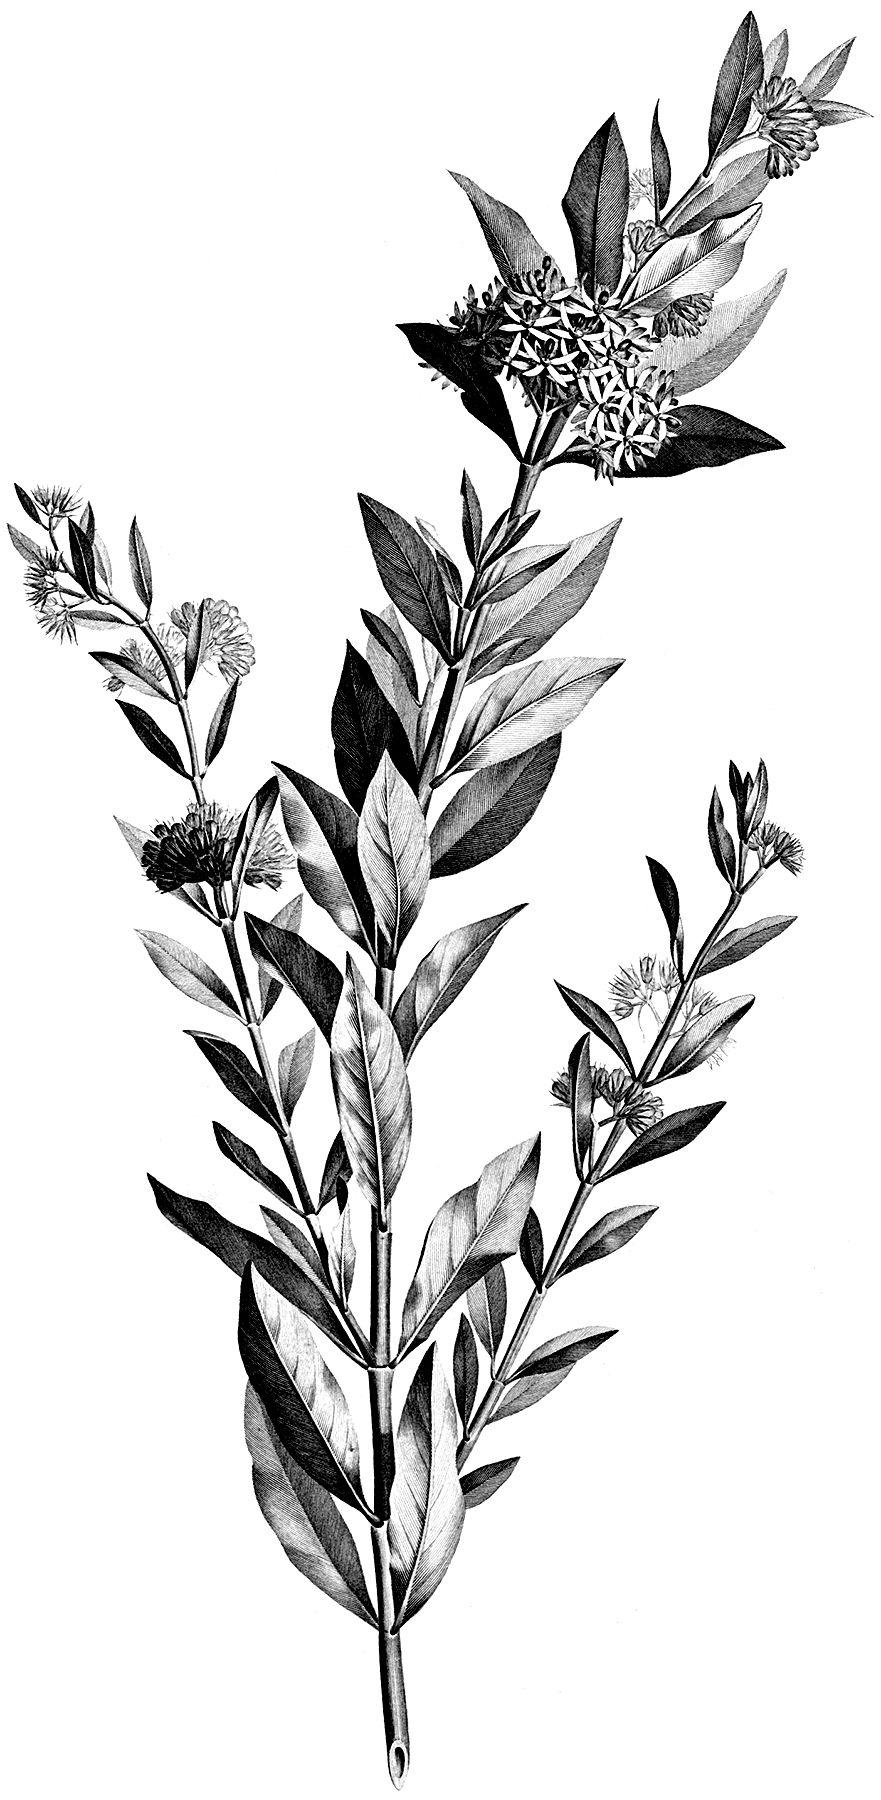 4 Black And White Botanical Stems Images Vintage Flower Tattoo Black And White Leaves Botanical Illustration Black And White